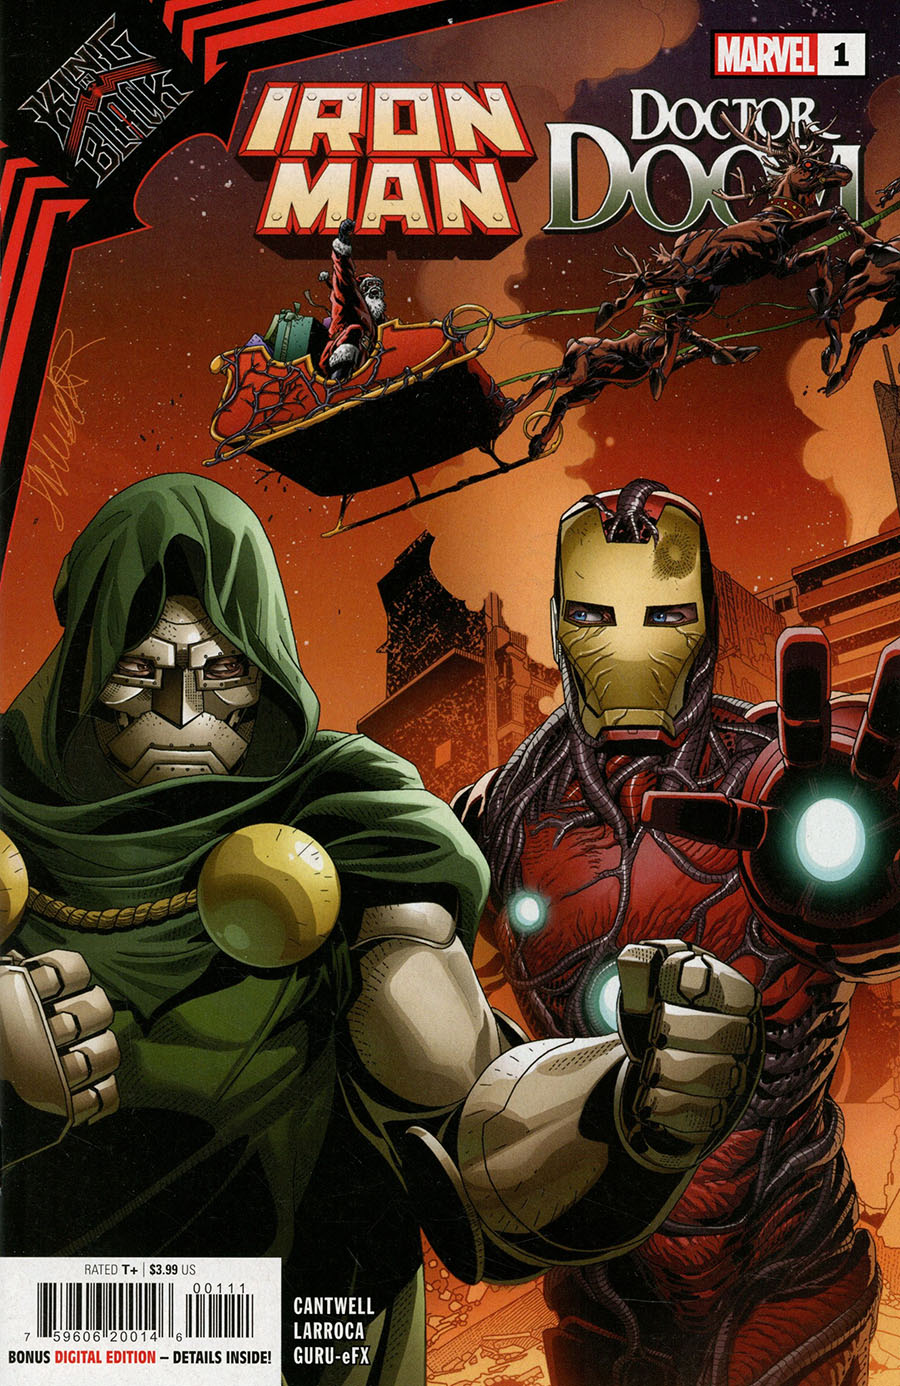 King In Black Iron Man Doctor Doom One Shot Cover A Regular Salvador Larroca Cover